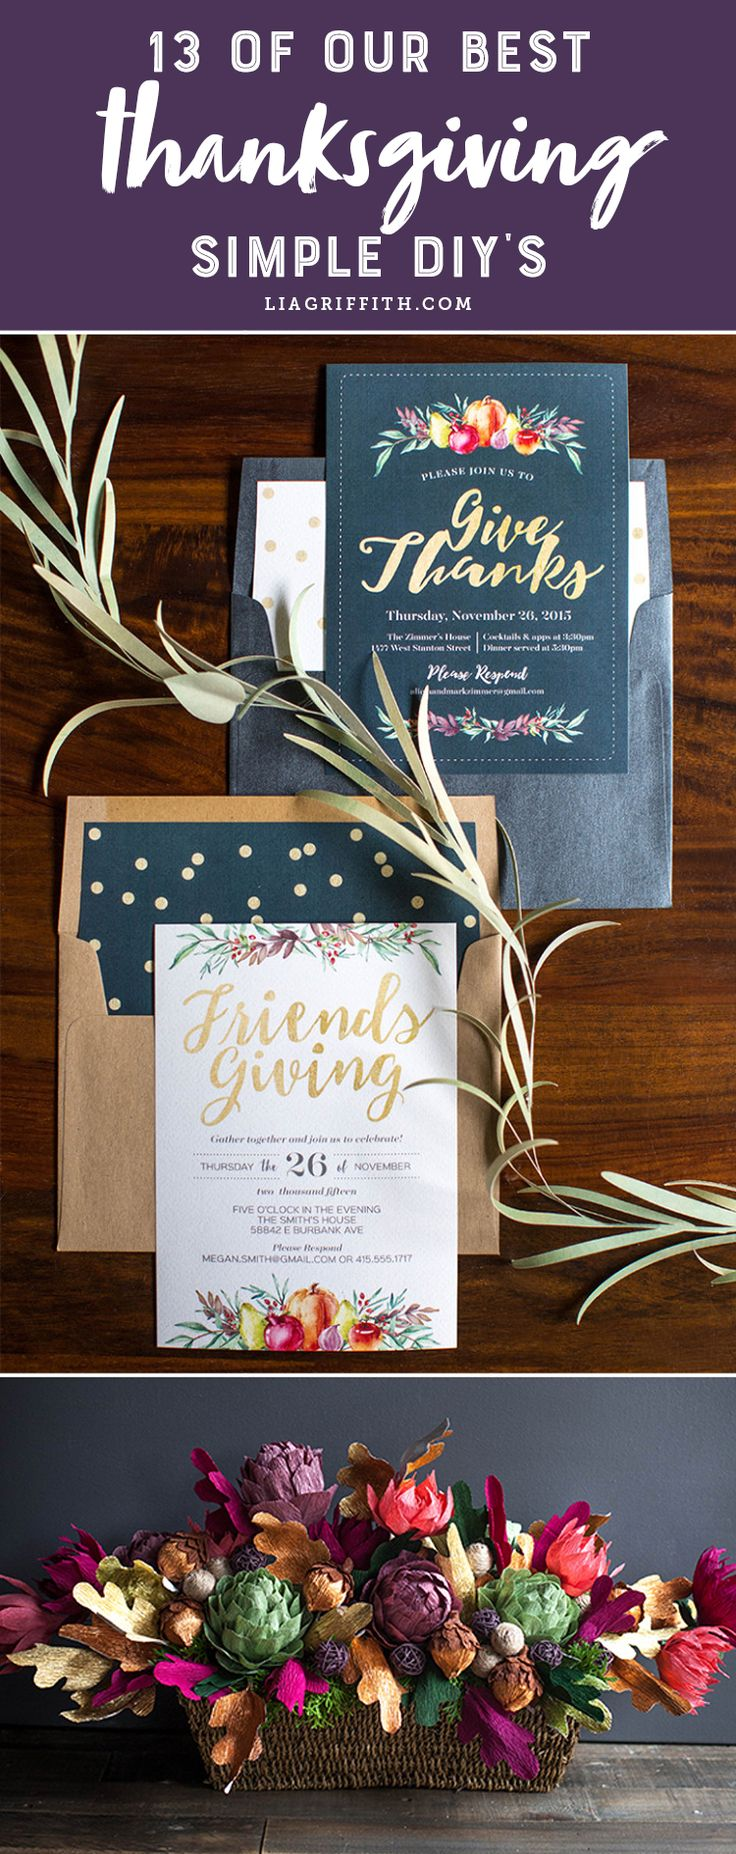 13 Simple Thanksgiving DIYs Diy IdeasDecor IdeasCraft